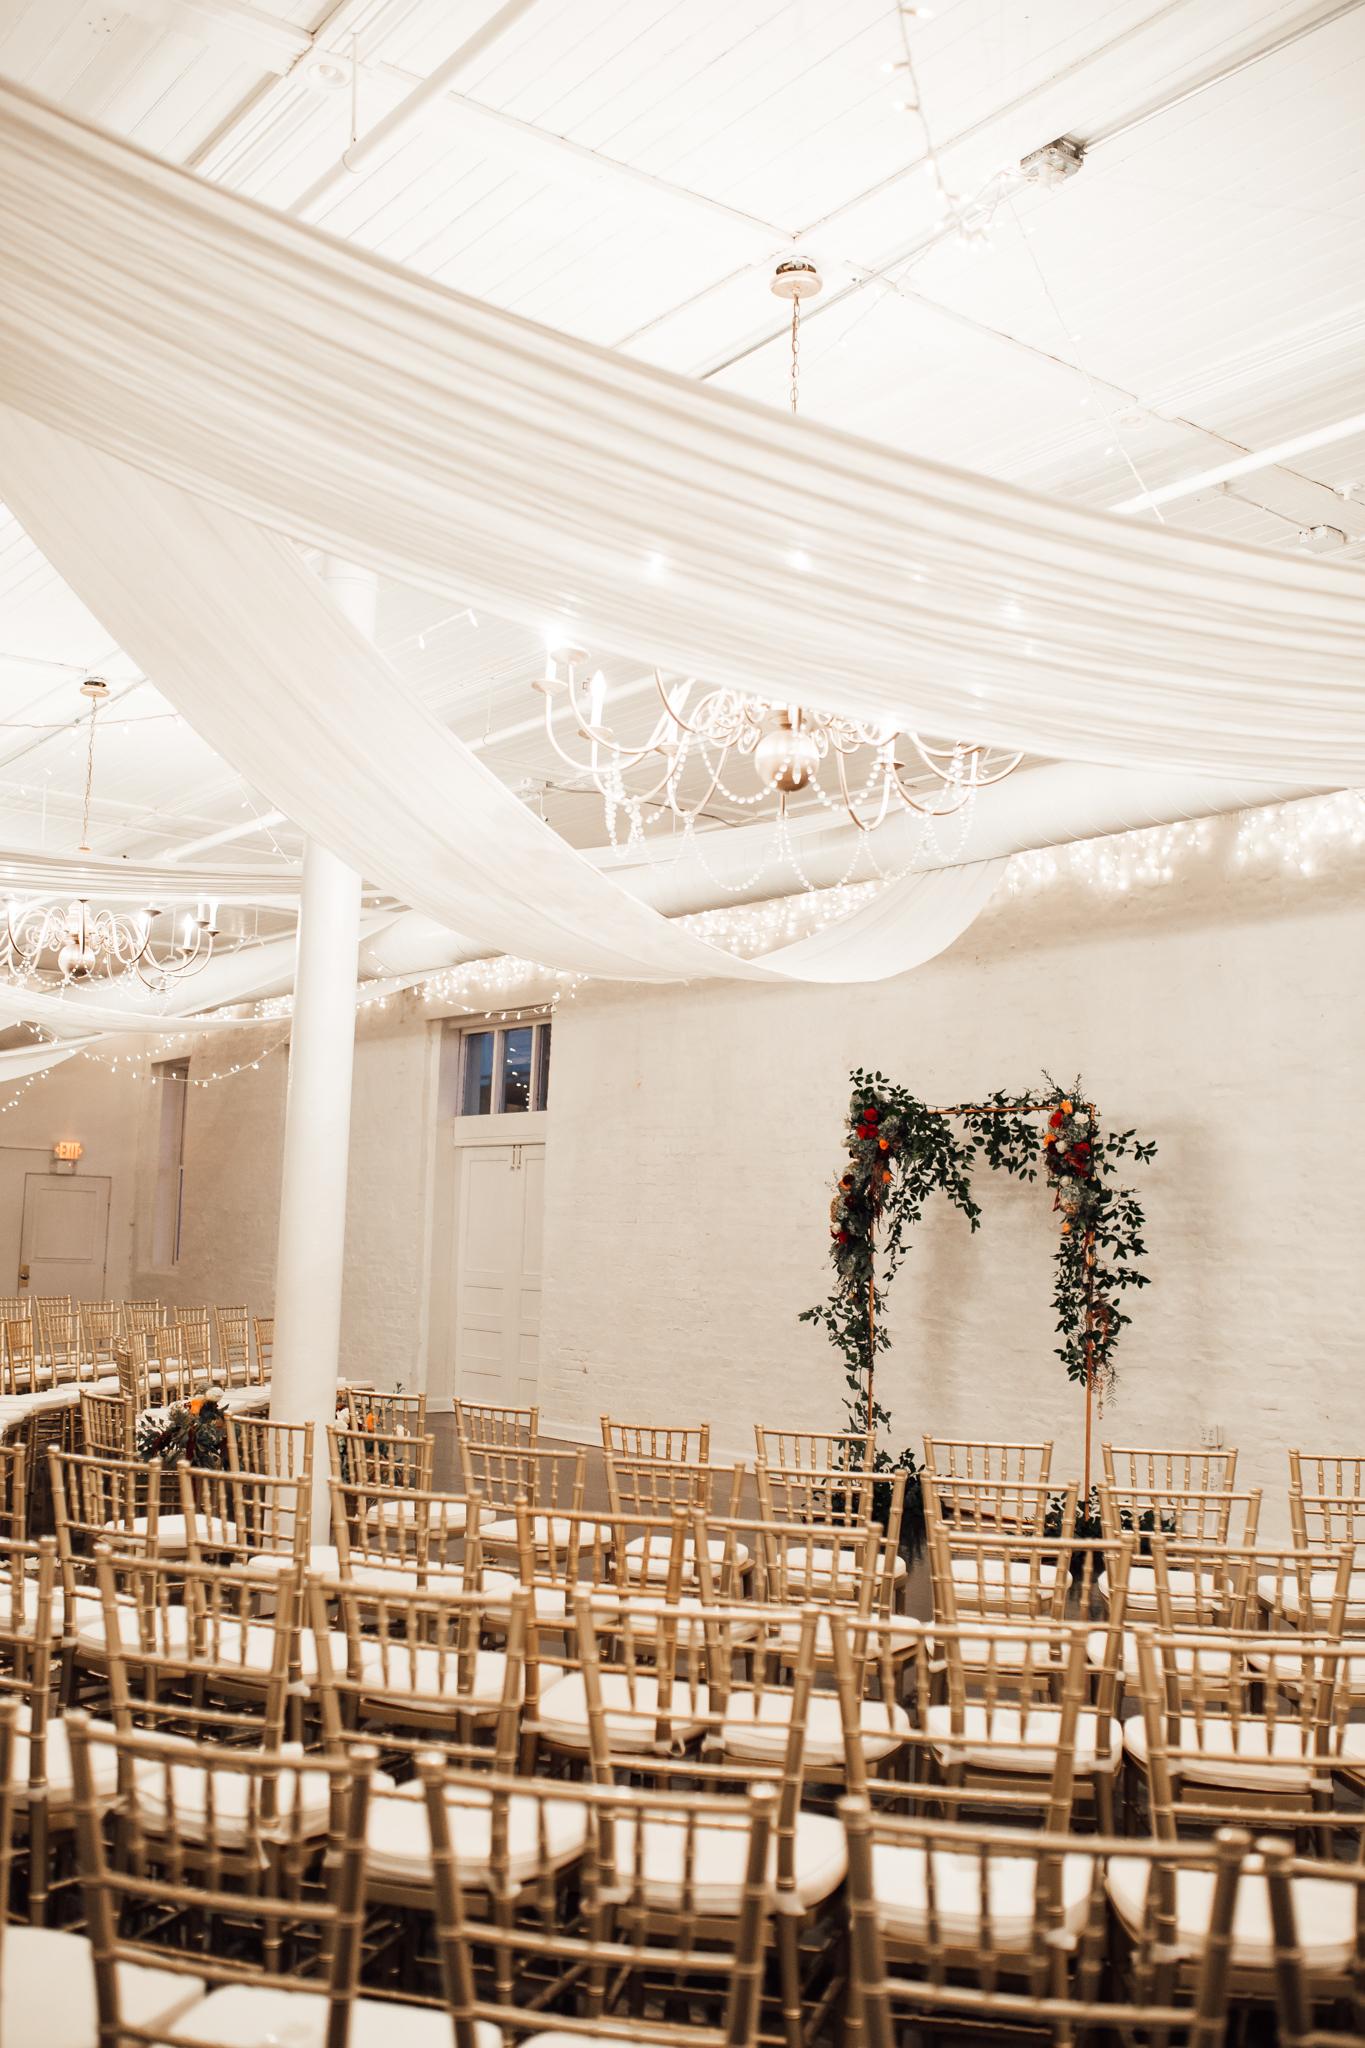 memphis-wedding-photographers-thewarmtharoundyou-ballinese-ballroom (28 of 65).jpg